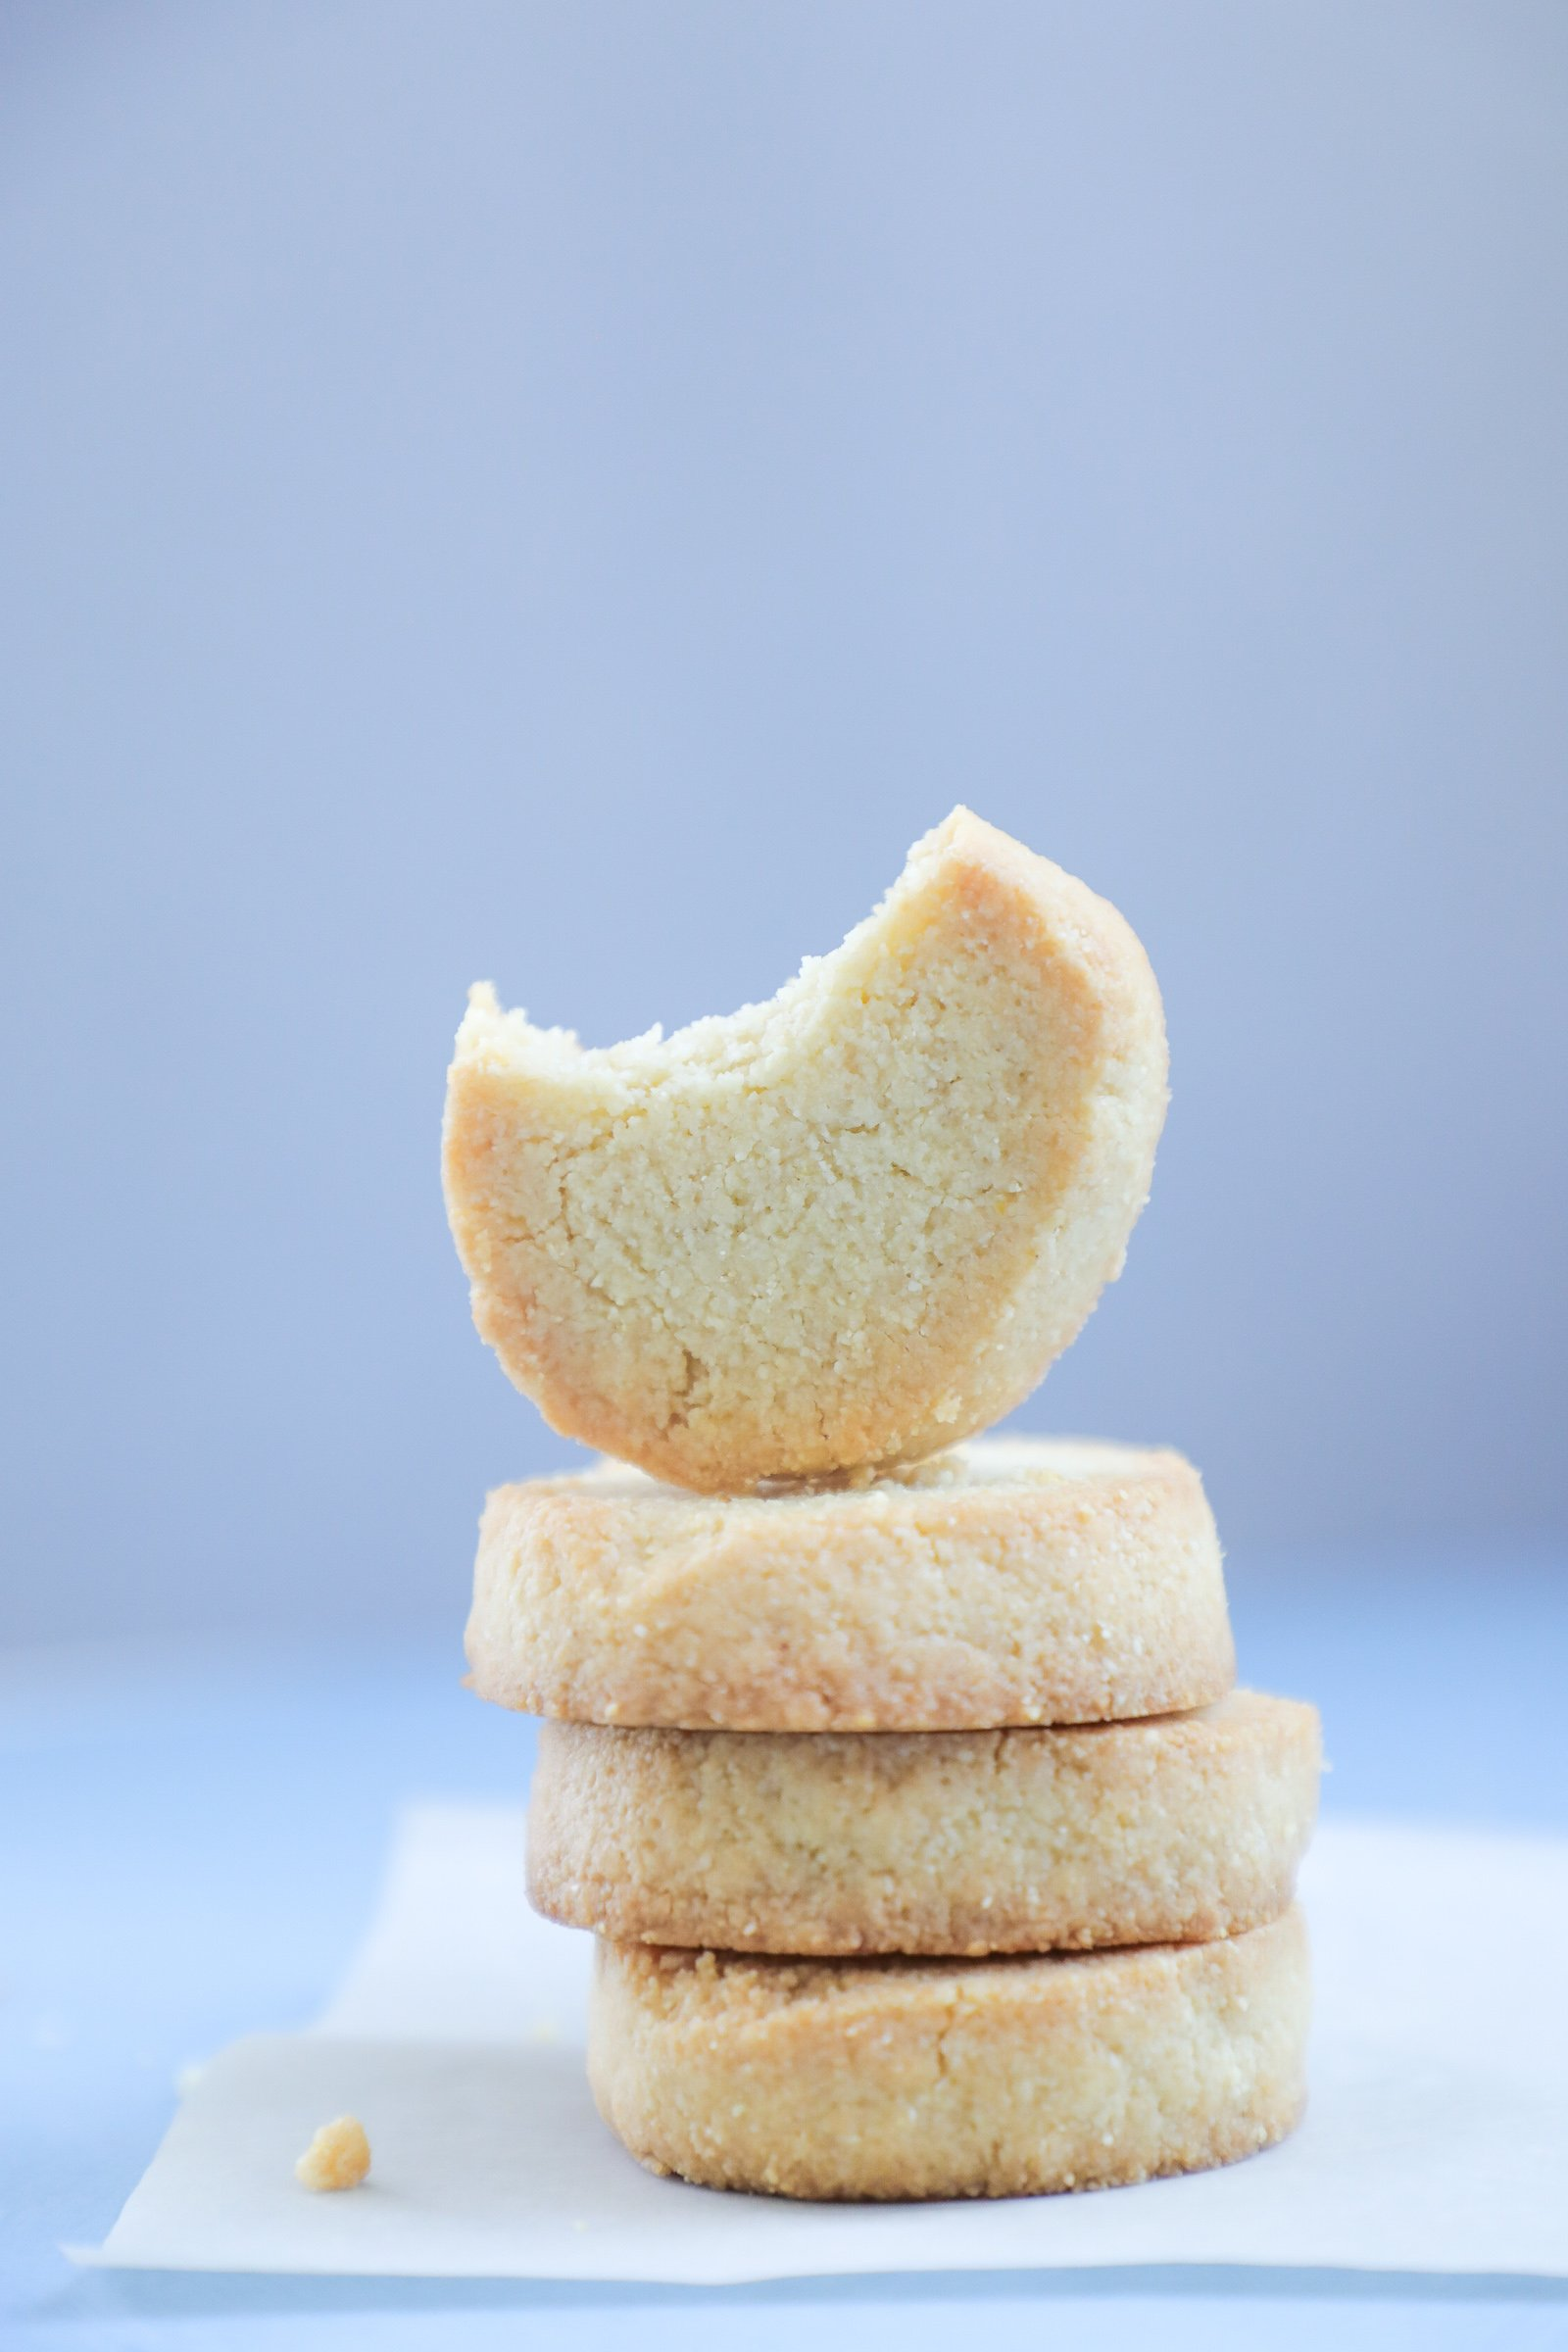 Keto Lemon Shortbread Cookie with a bite taken out of it.